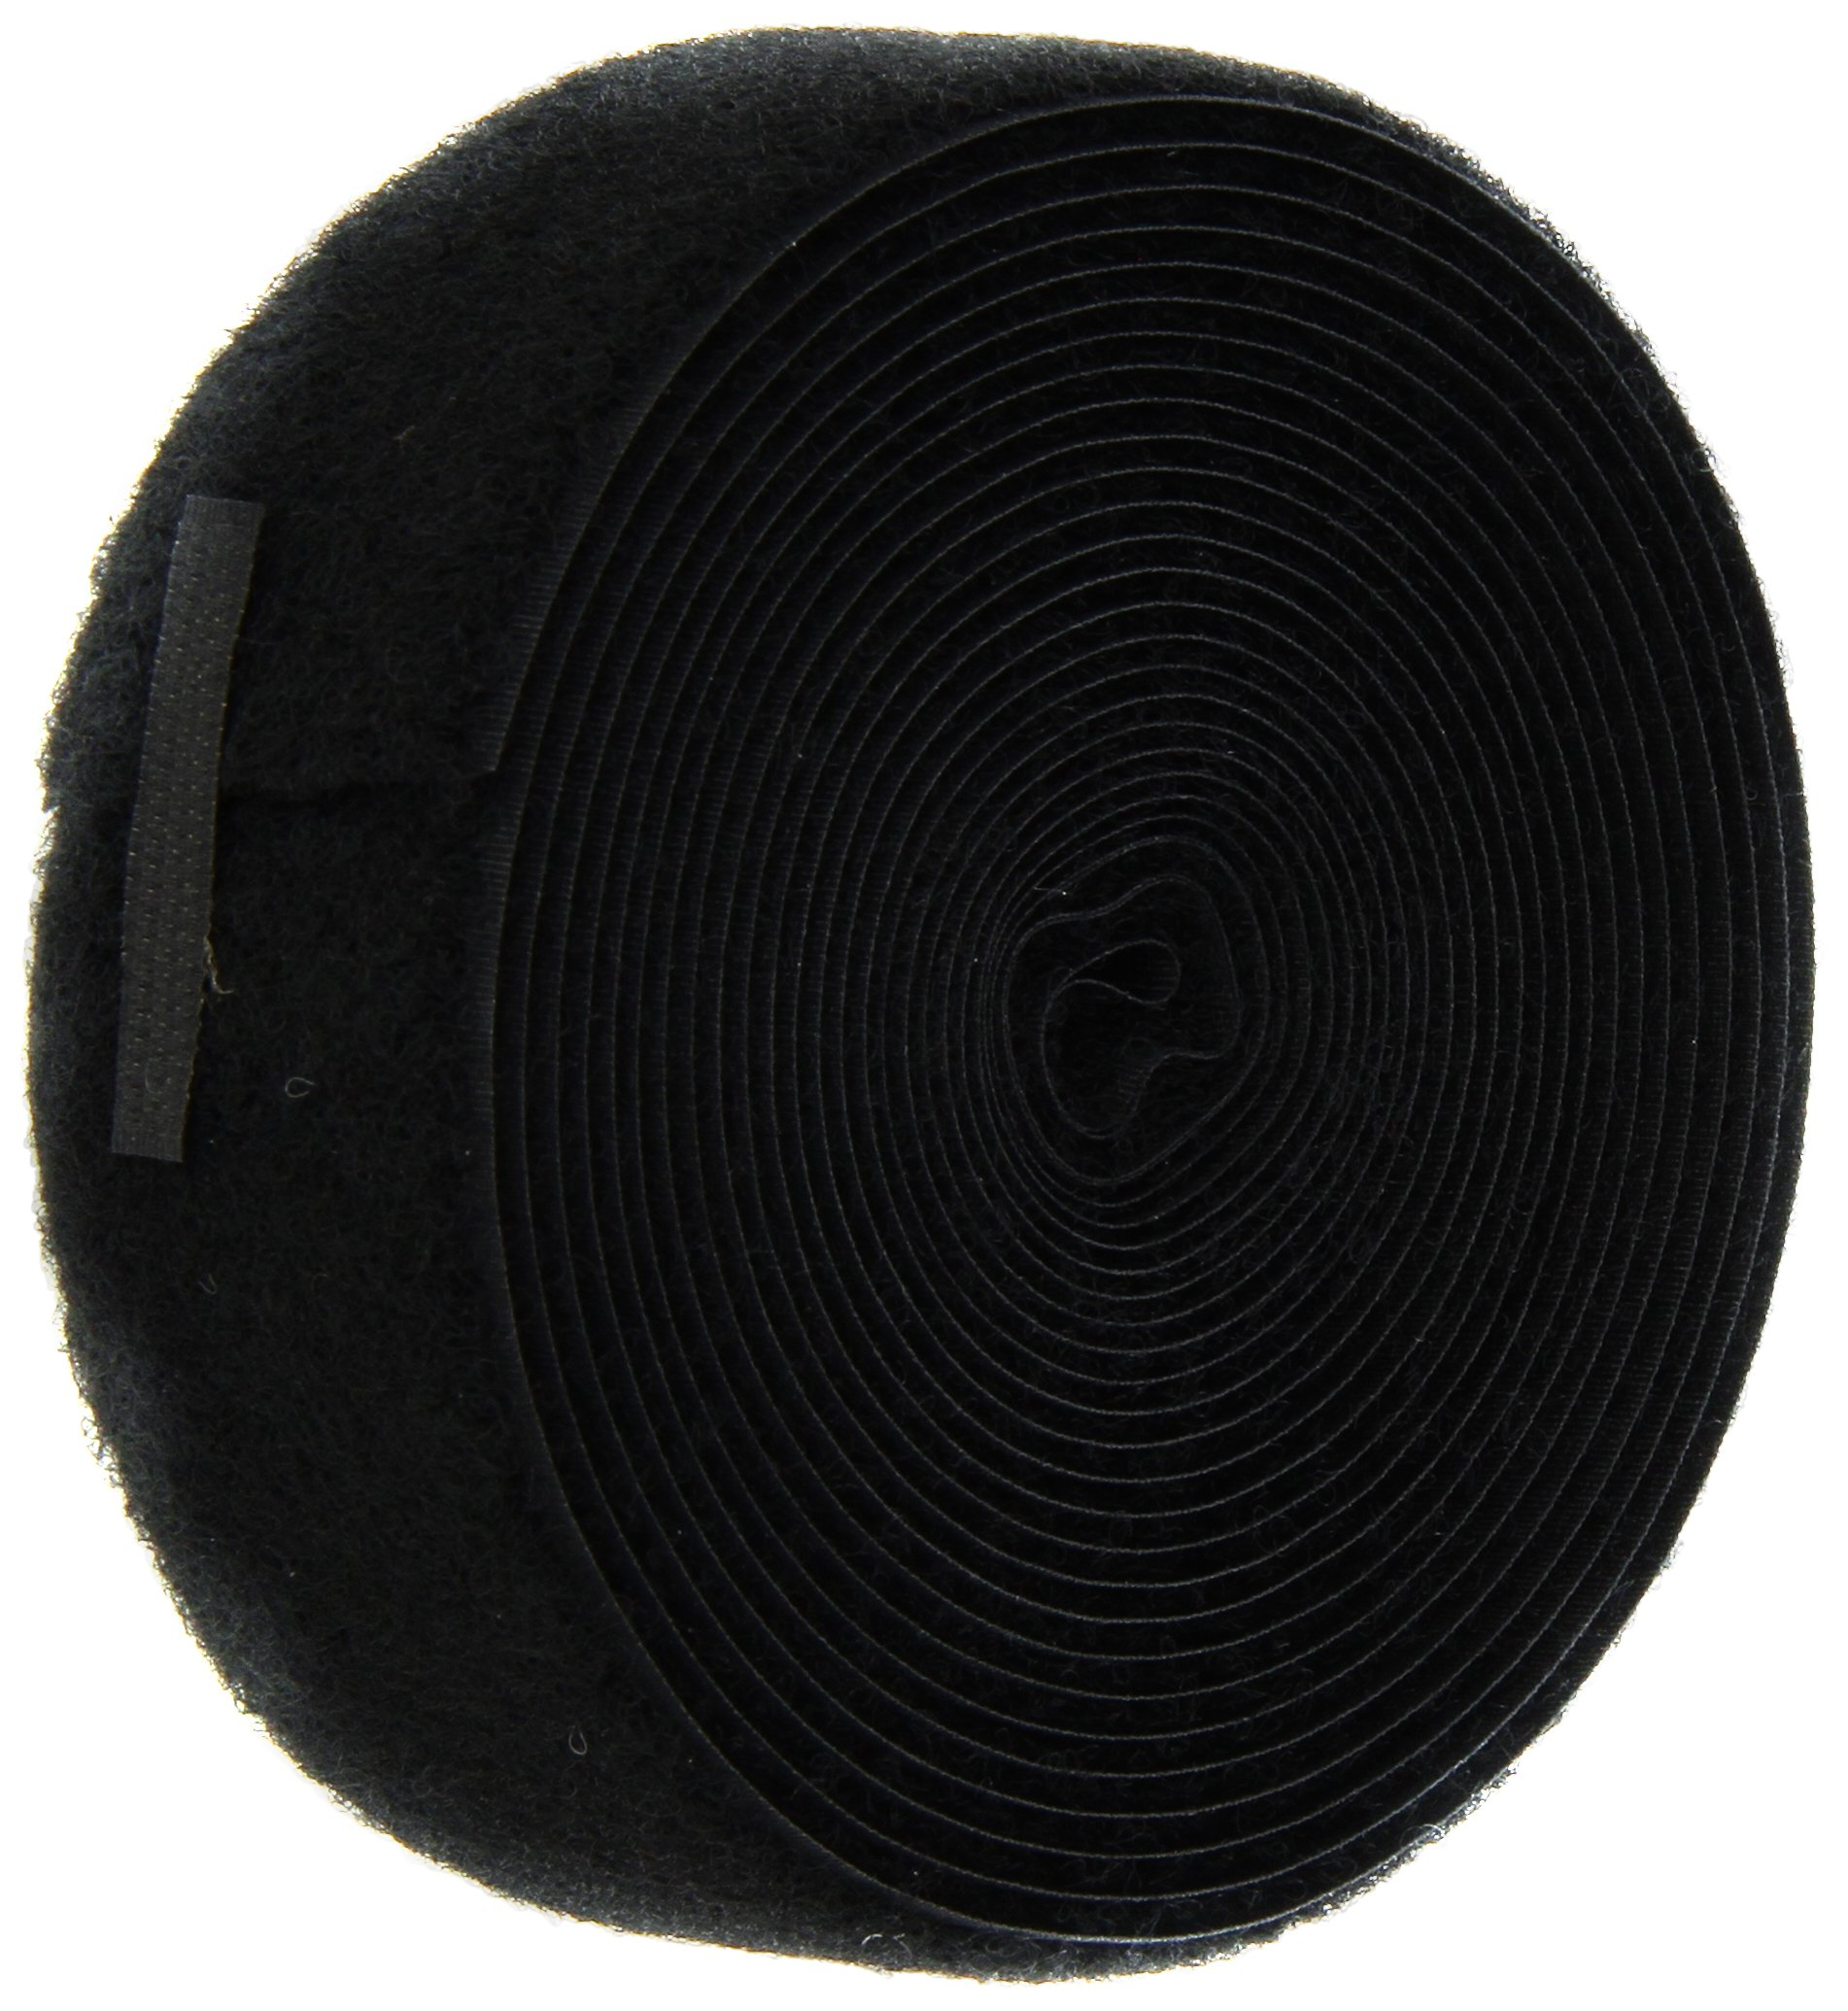 VELCRO 1005-AP-PB/L Black Nylon Woven Fastening Tape, Sew-On Loop Only, Standard Back, 1-1/2'' Wide, 15' Length